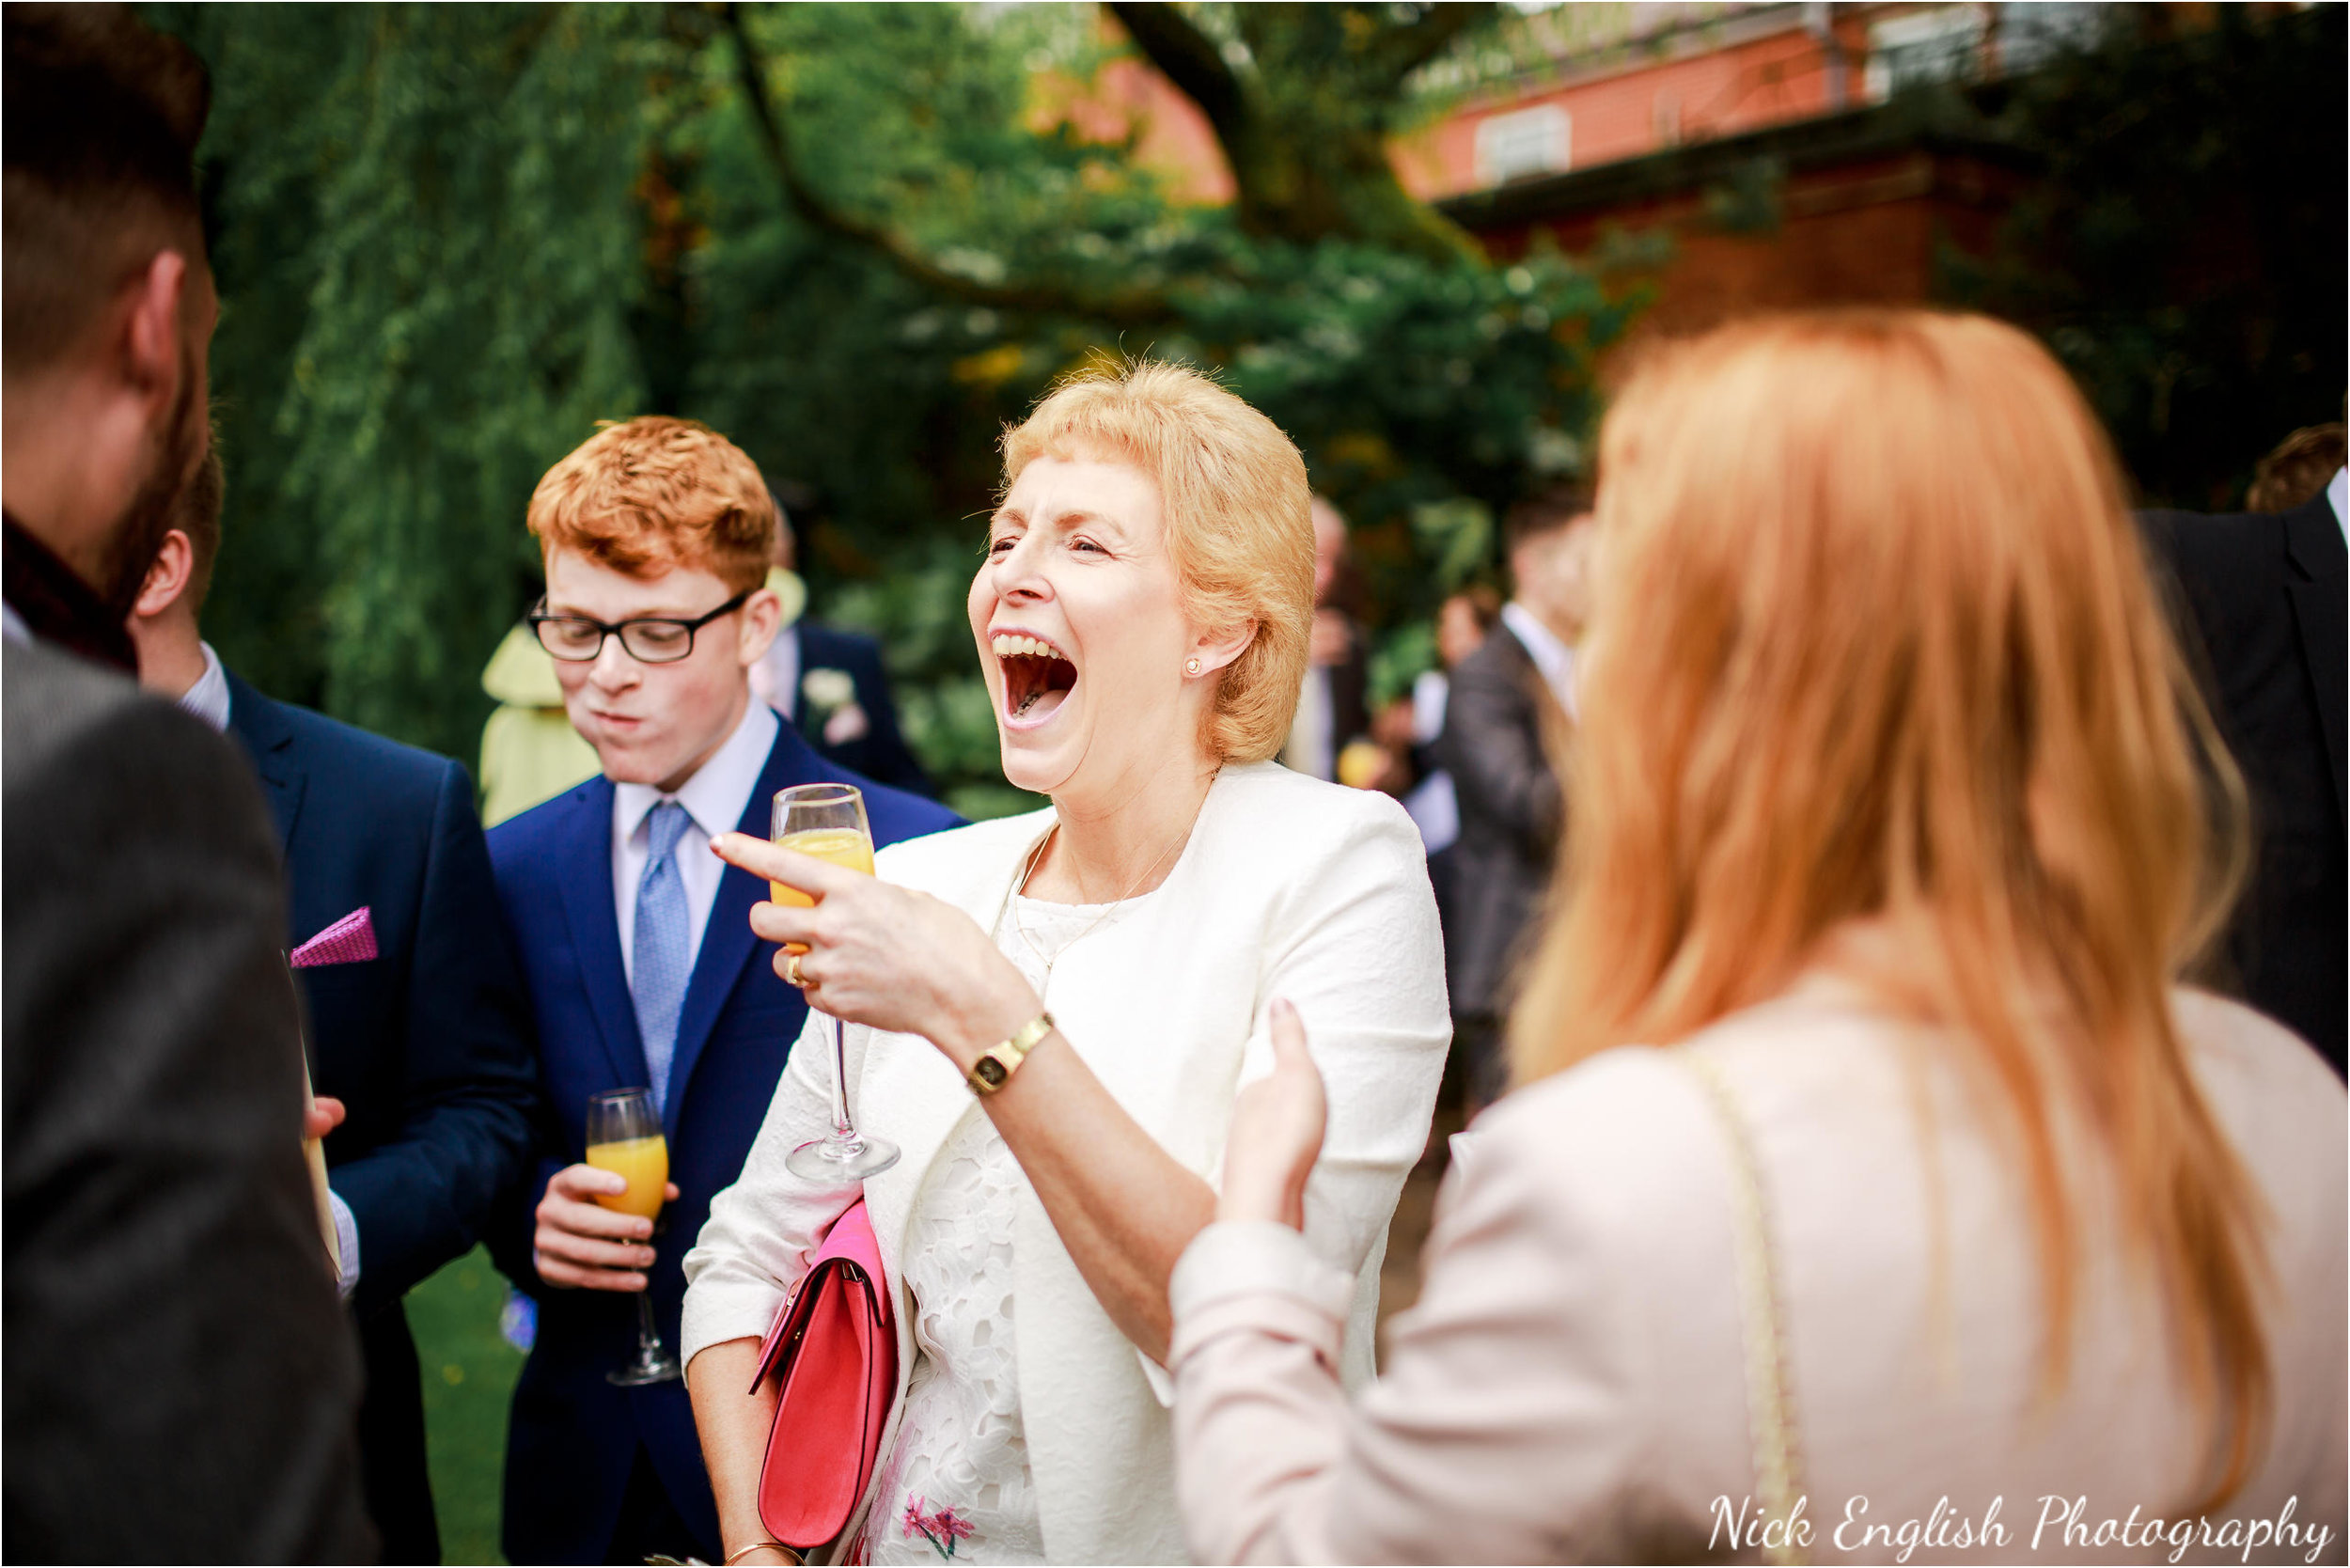 Emily David Wedding Photographs at Barton Grange Preston by Nick English Photography 109jpg.jpeg